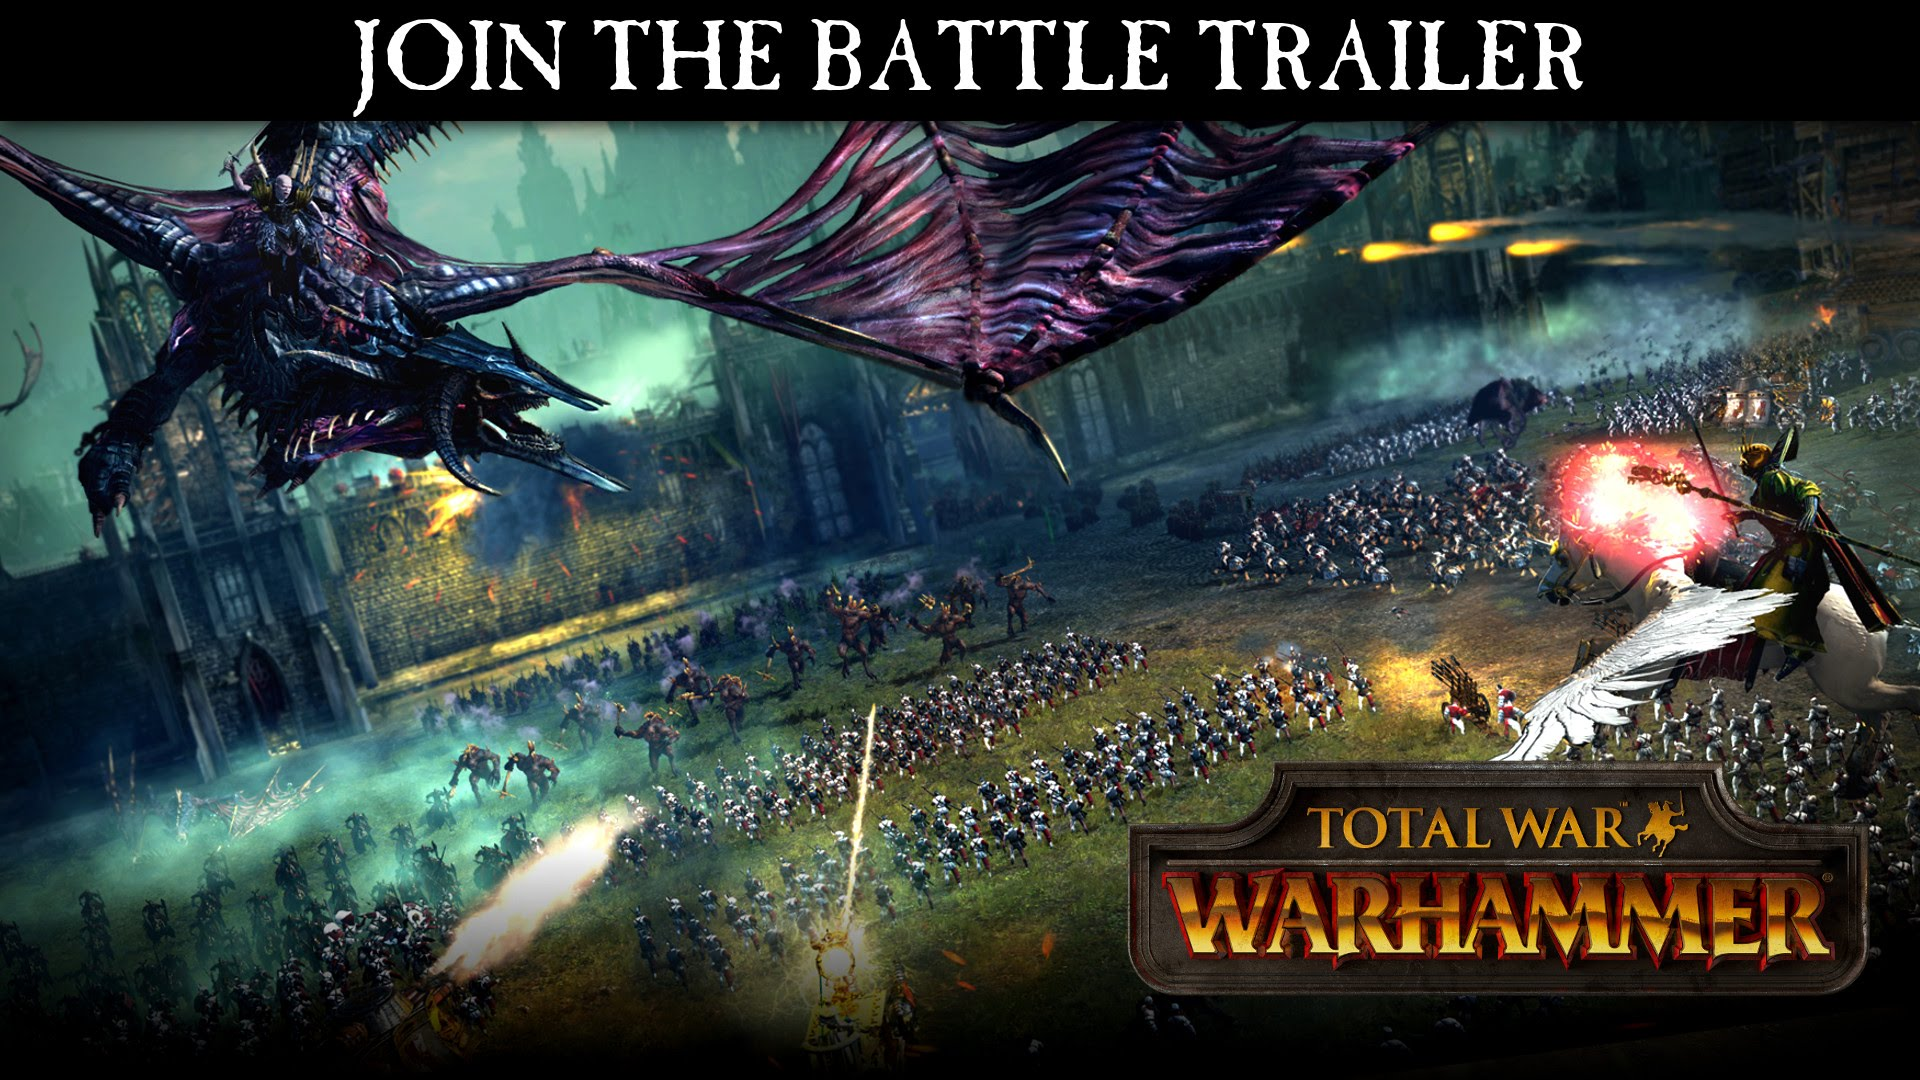 Total War: Warhammer primește trailer de lansare